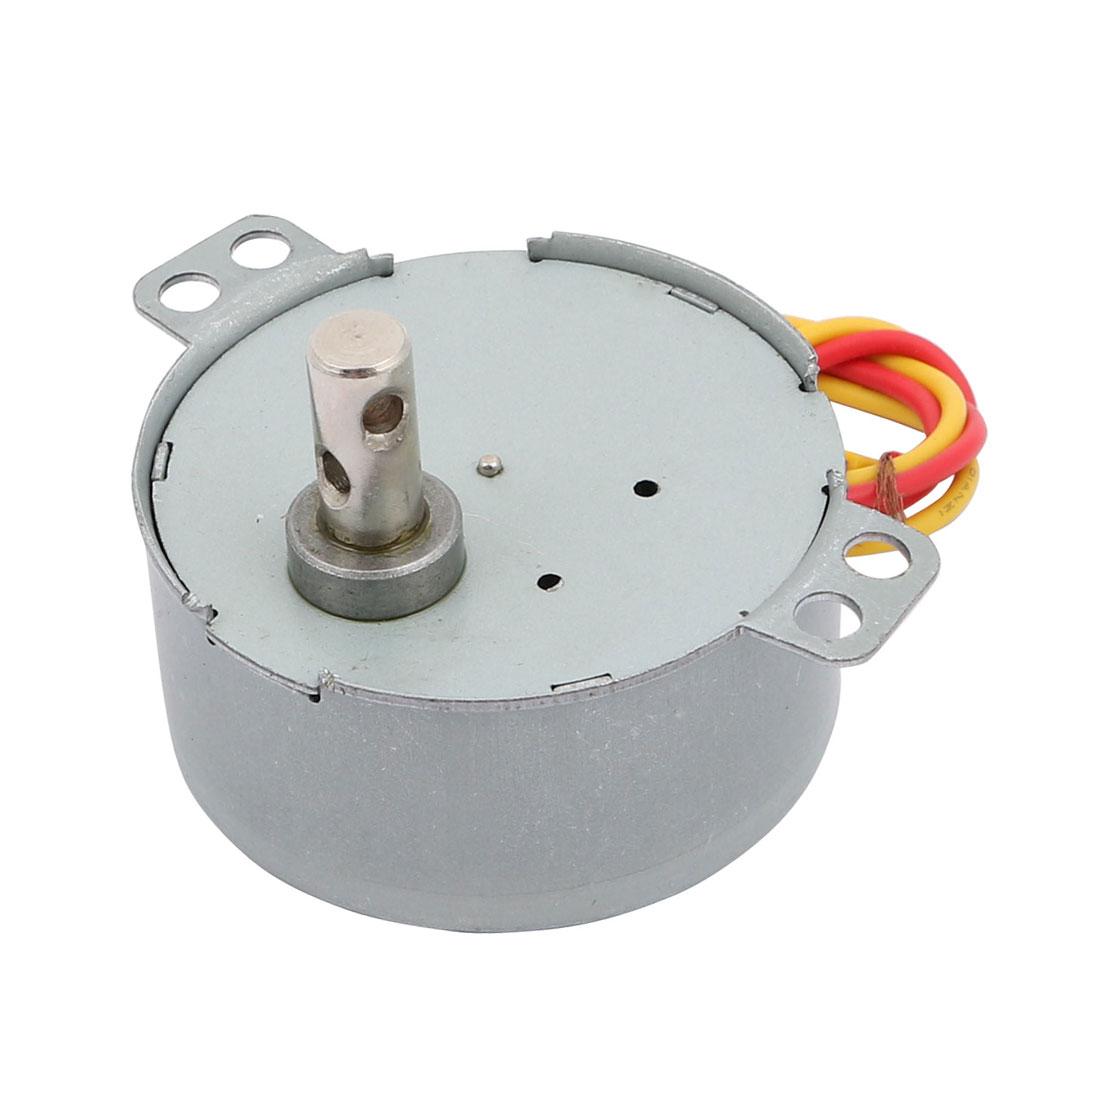 TYZ-50 AC220V/240V 50/60Hz 2 Wired Electric Mini Vibration Vibrate Motor